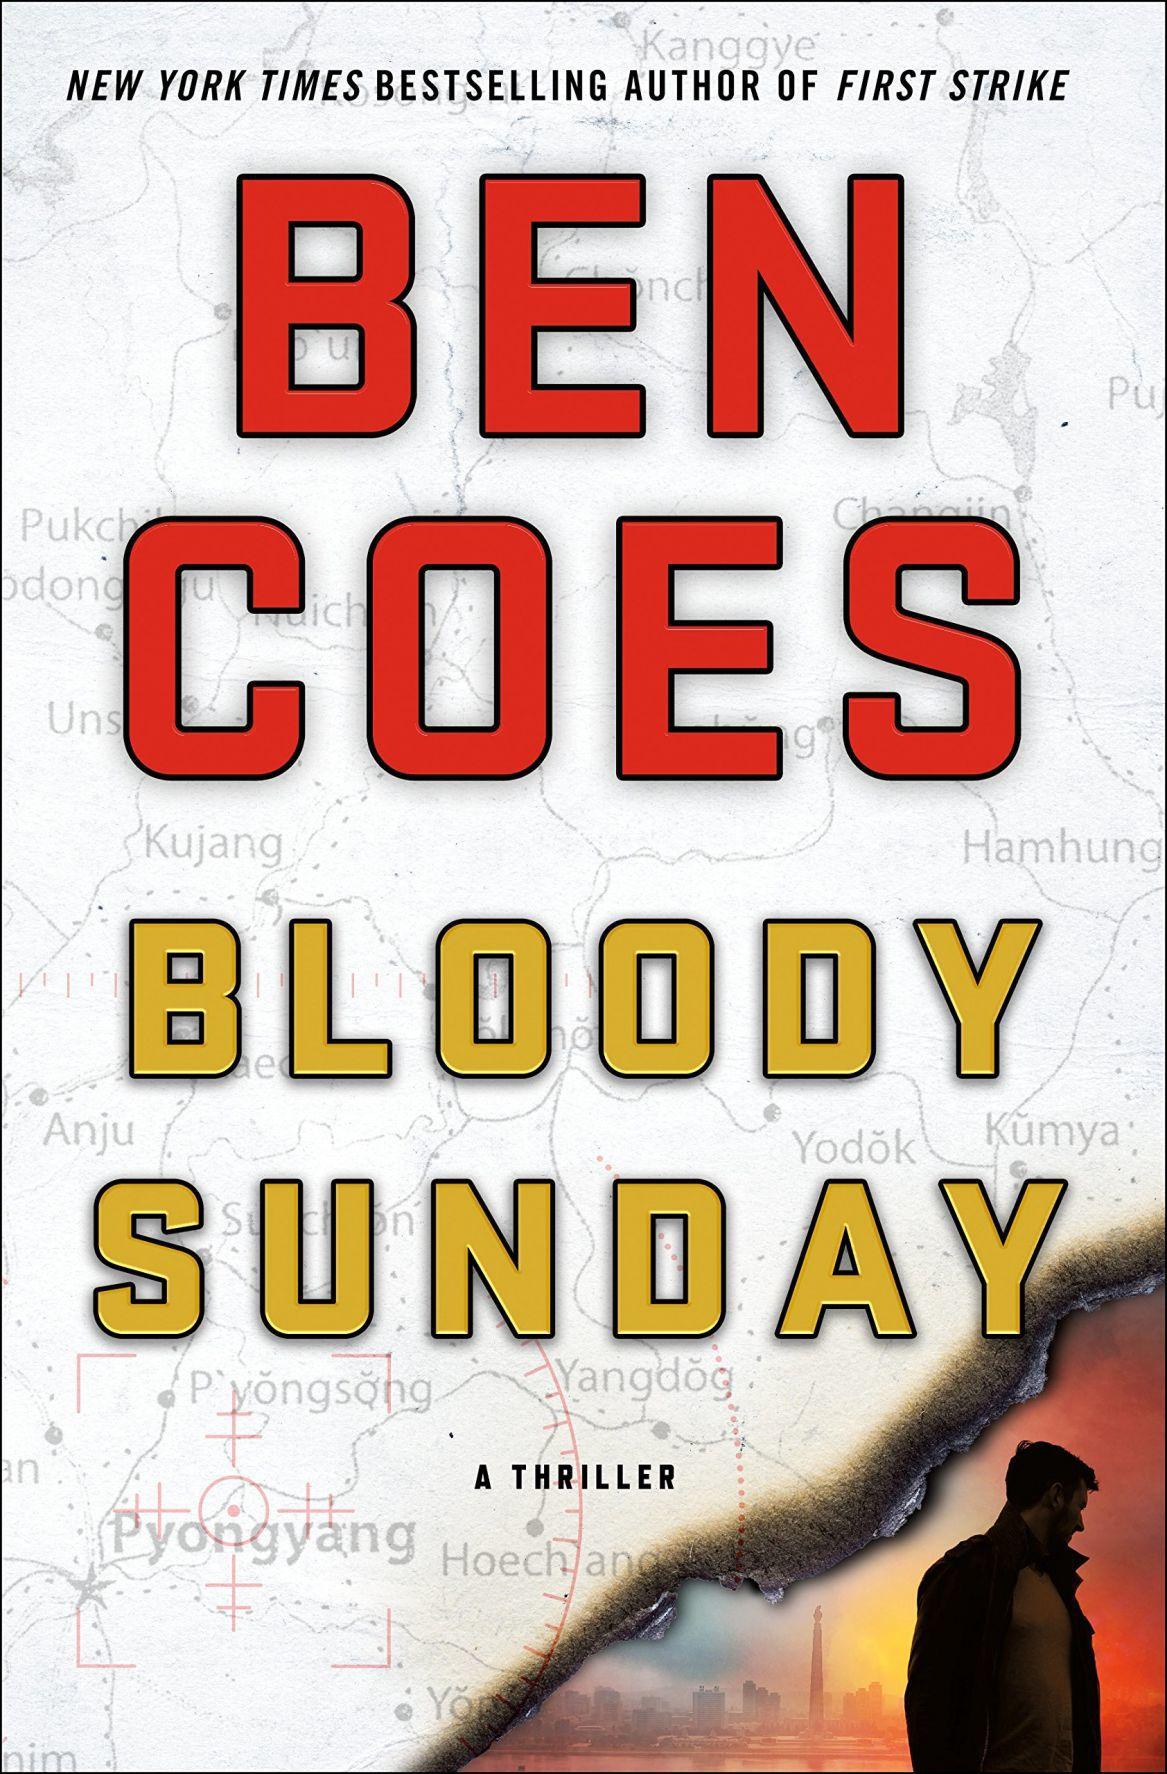 20190127-gm-book-bloody sunday.jpg